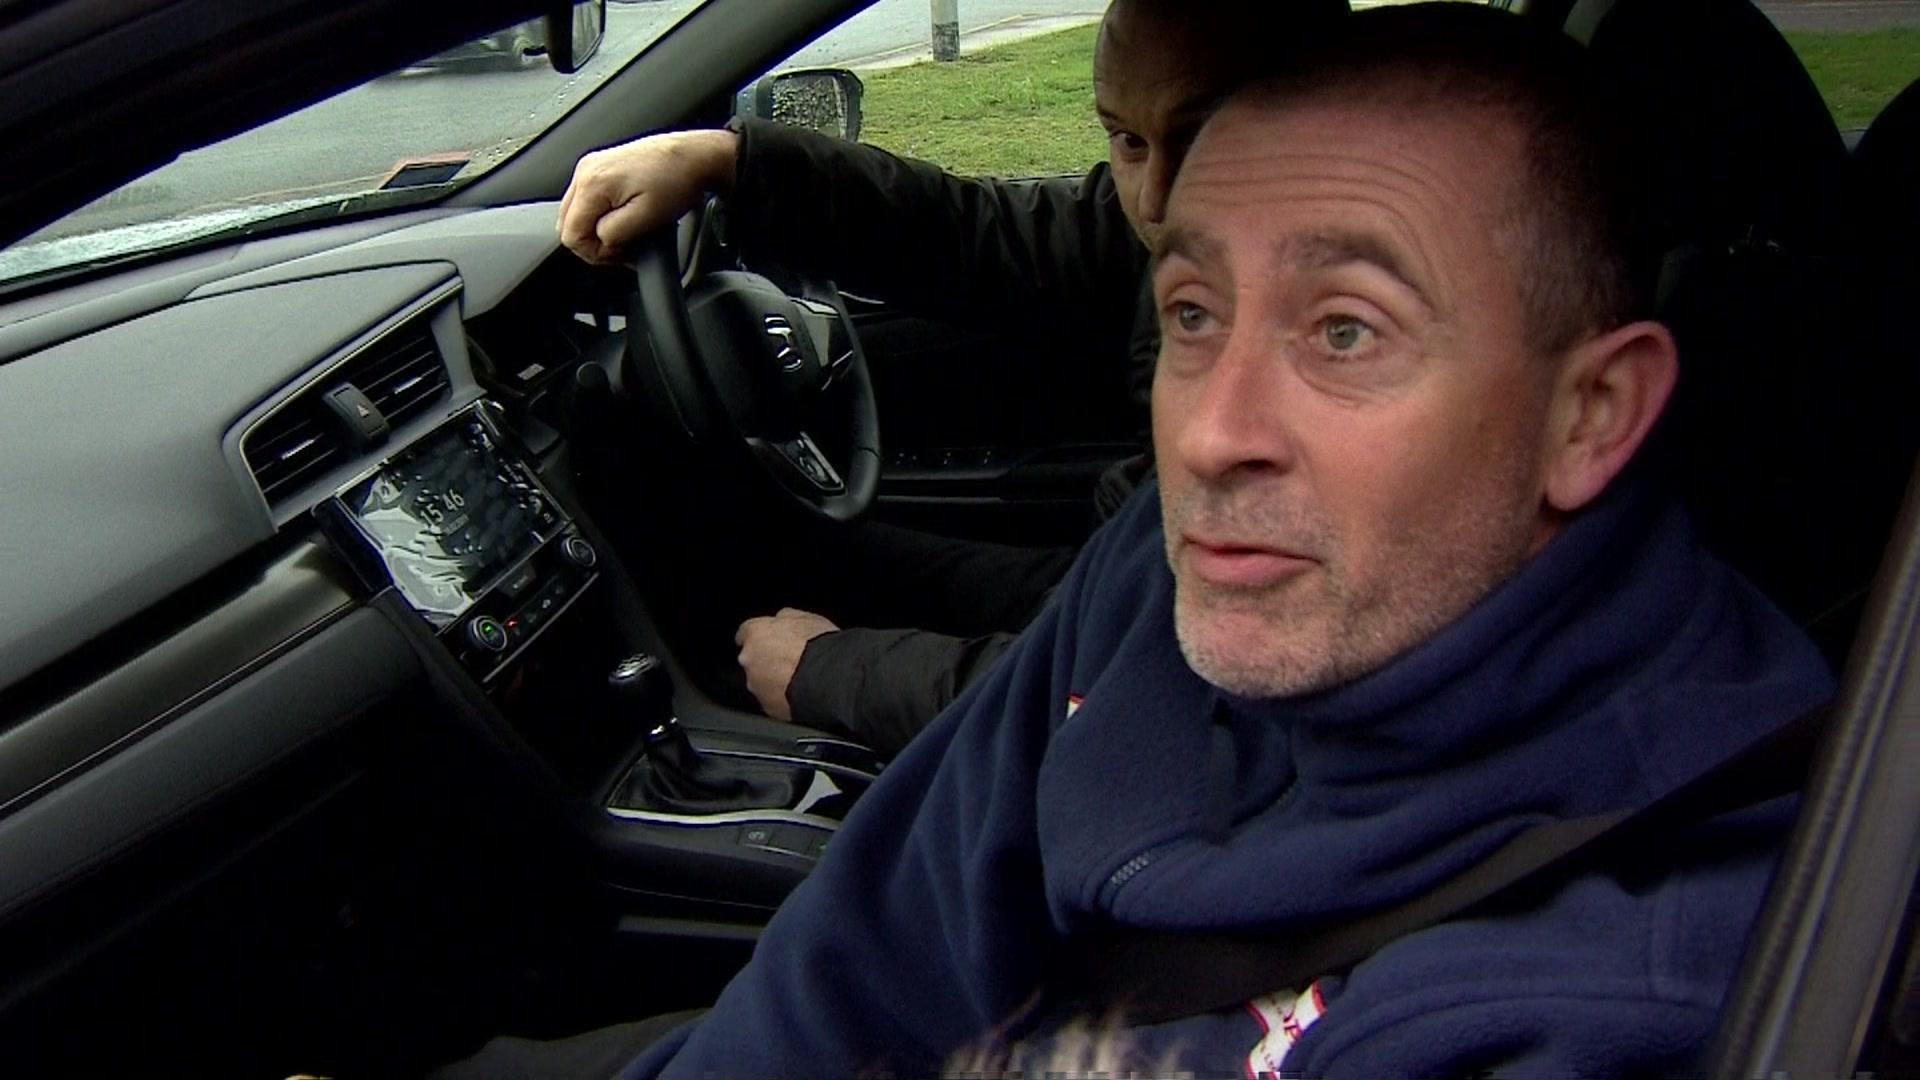 Honda car plant closure: 'A sad day for Swindon'